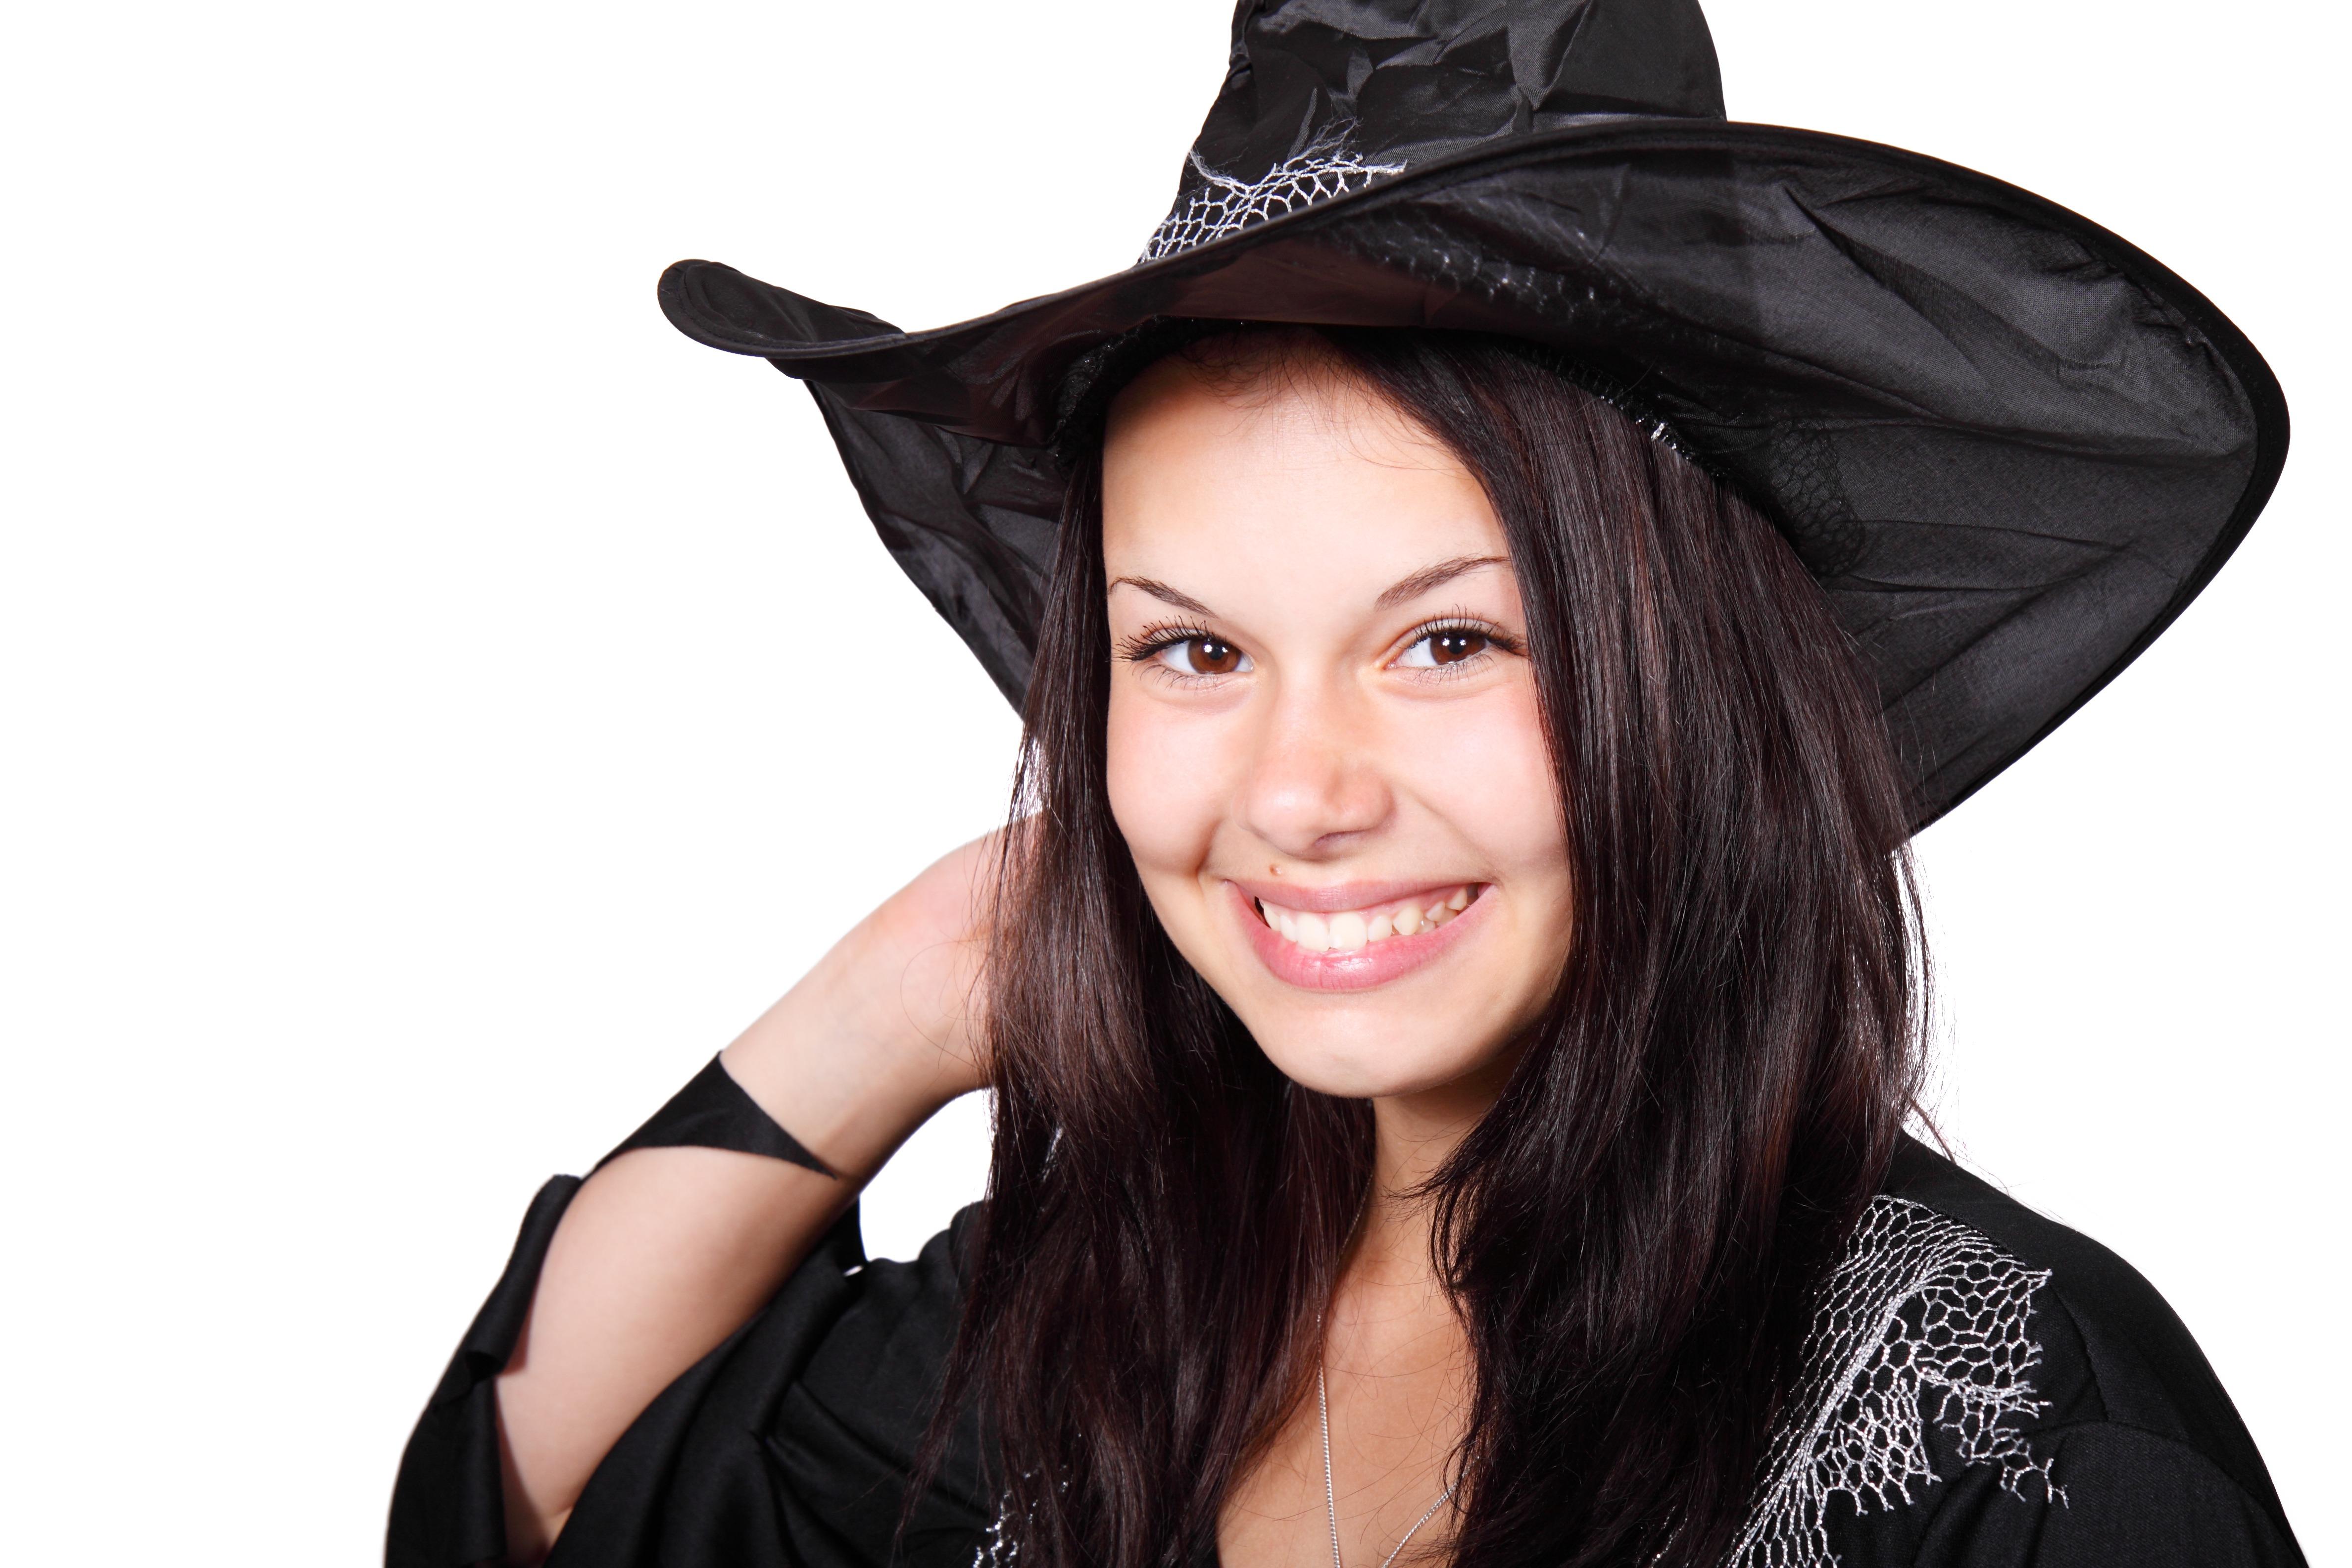 gadis wanita imut wanita muda halloween topi pakaian hitam penutup kepala tersenyum senang topi sihir tubuh